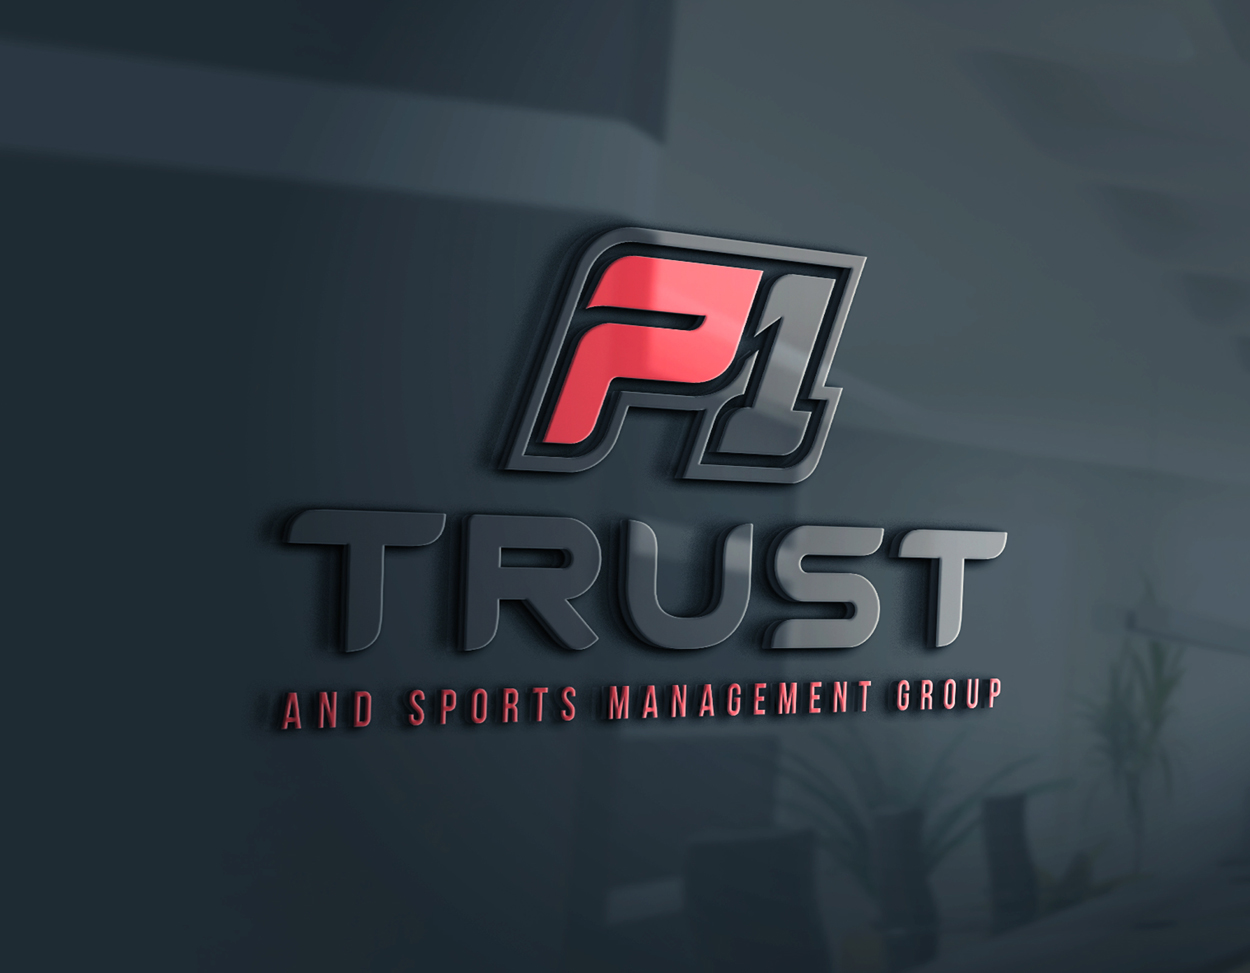 P1 Trust and Sports Management NFL Logo Design